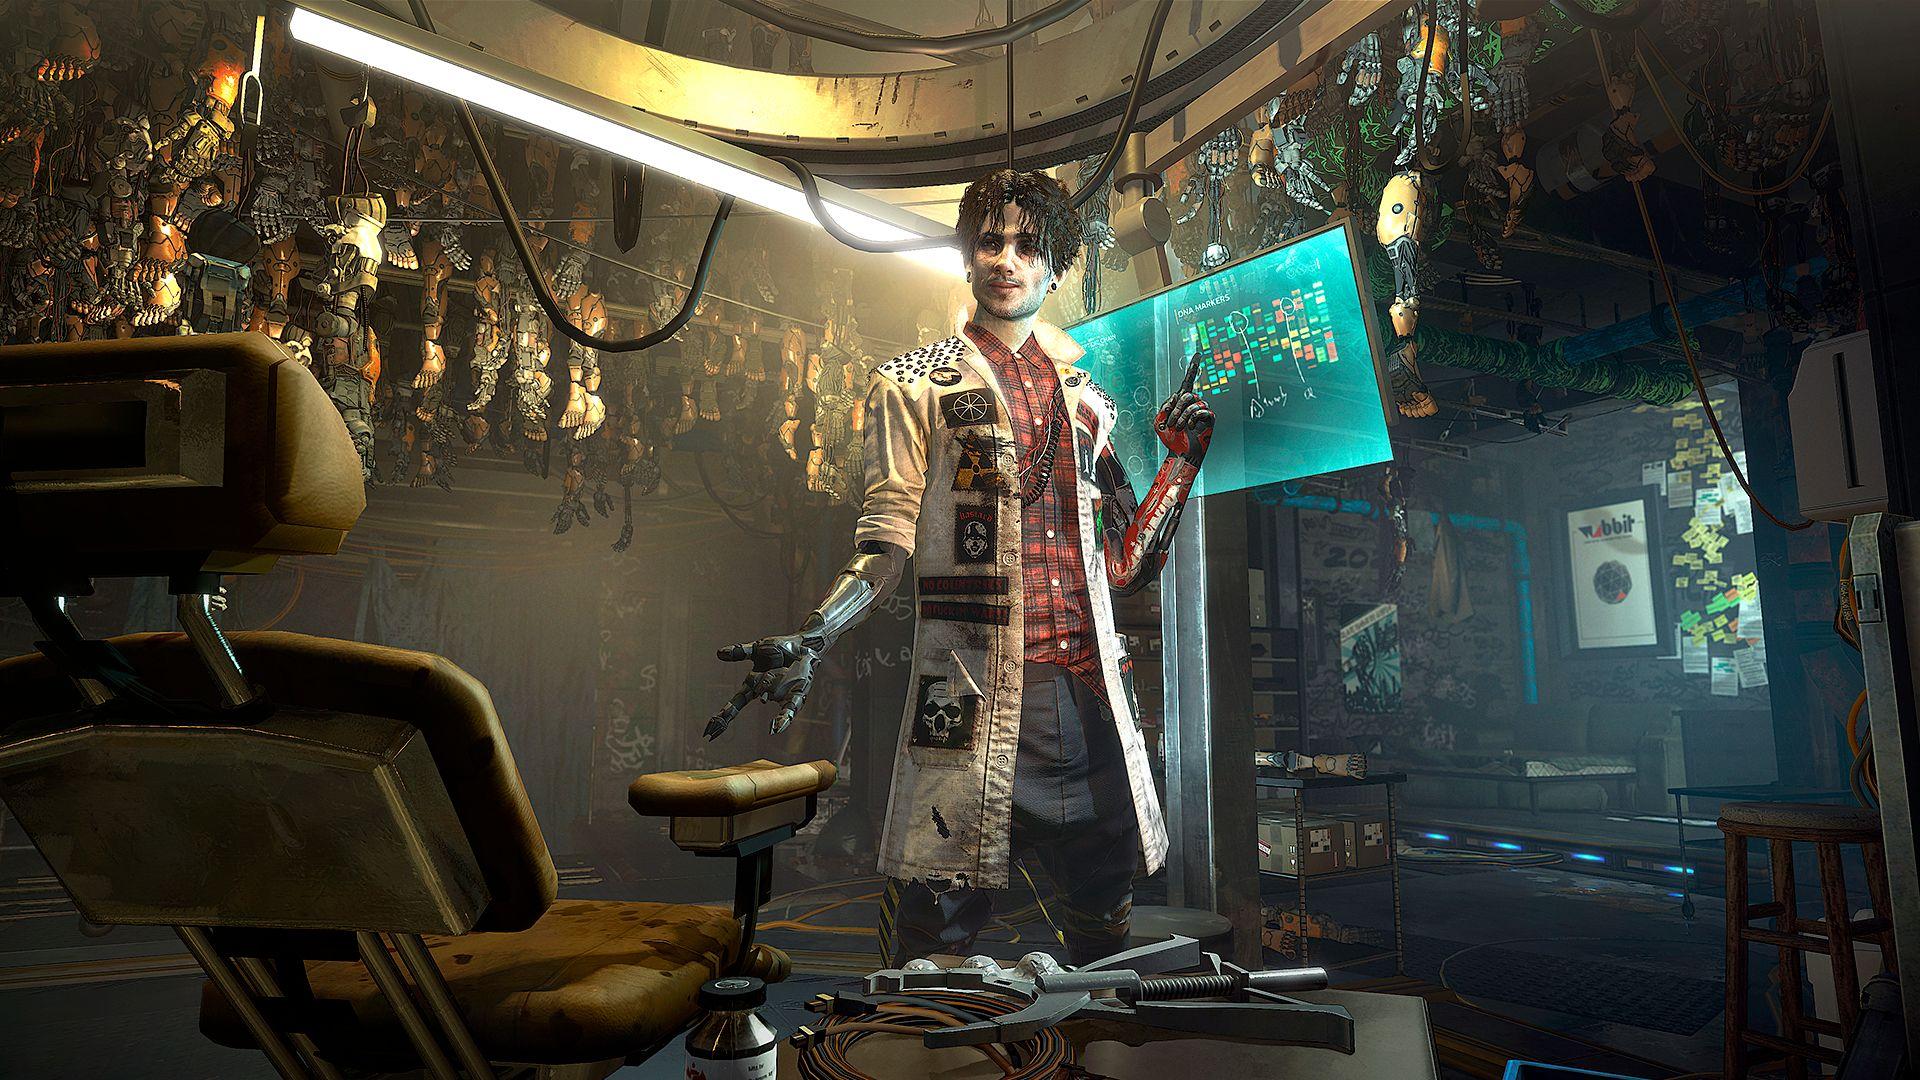 A screenshot of Vaclav, an underground augmentation specialist from Deus Ex: Mankind Divided.